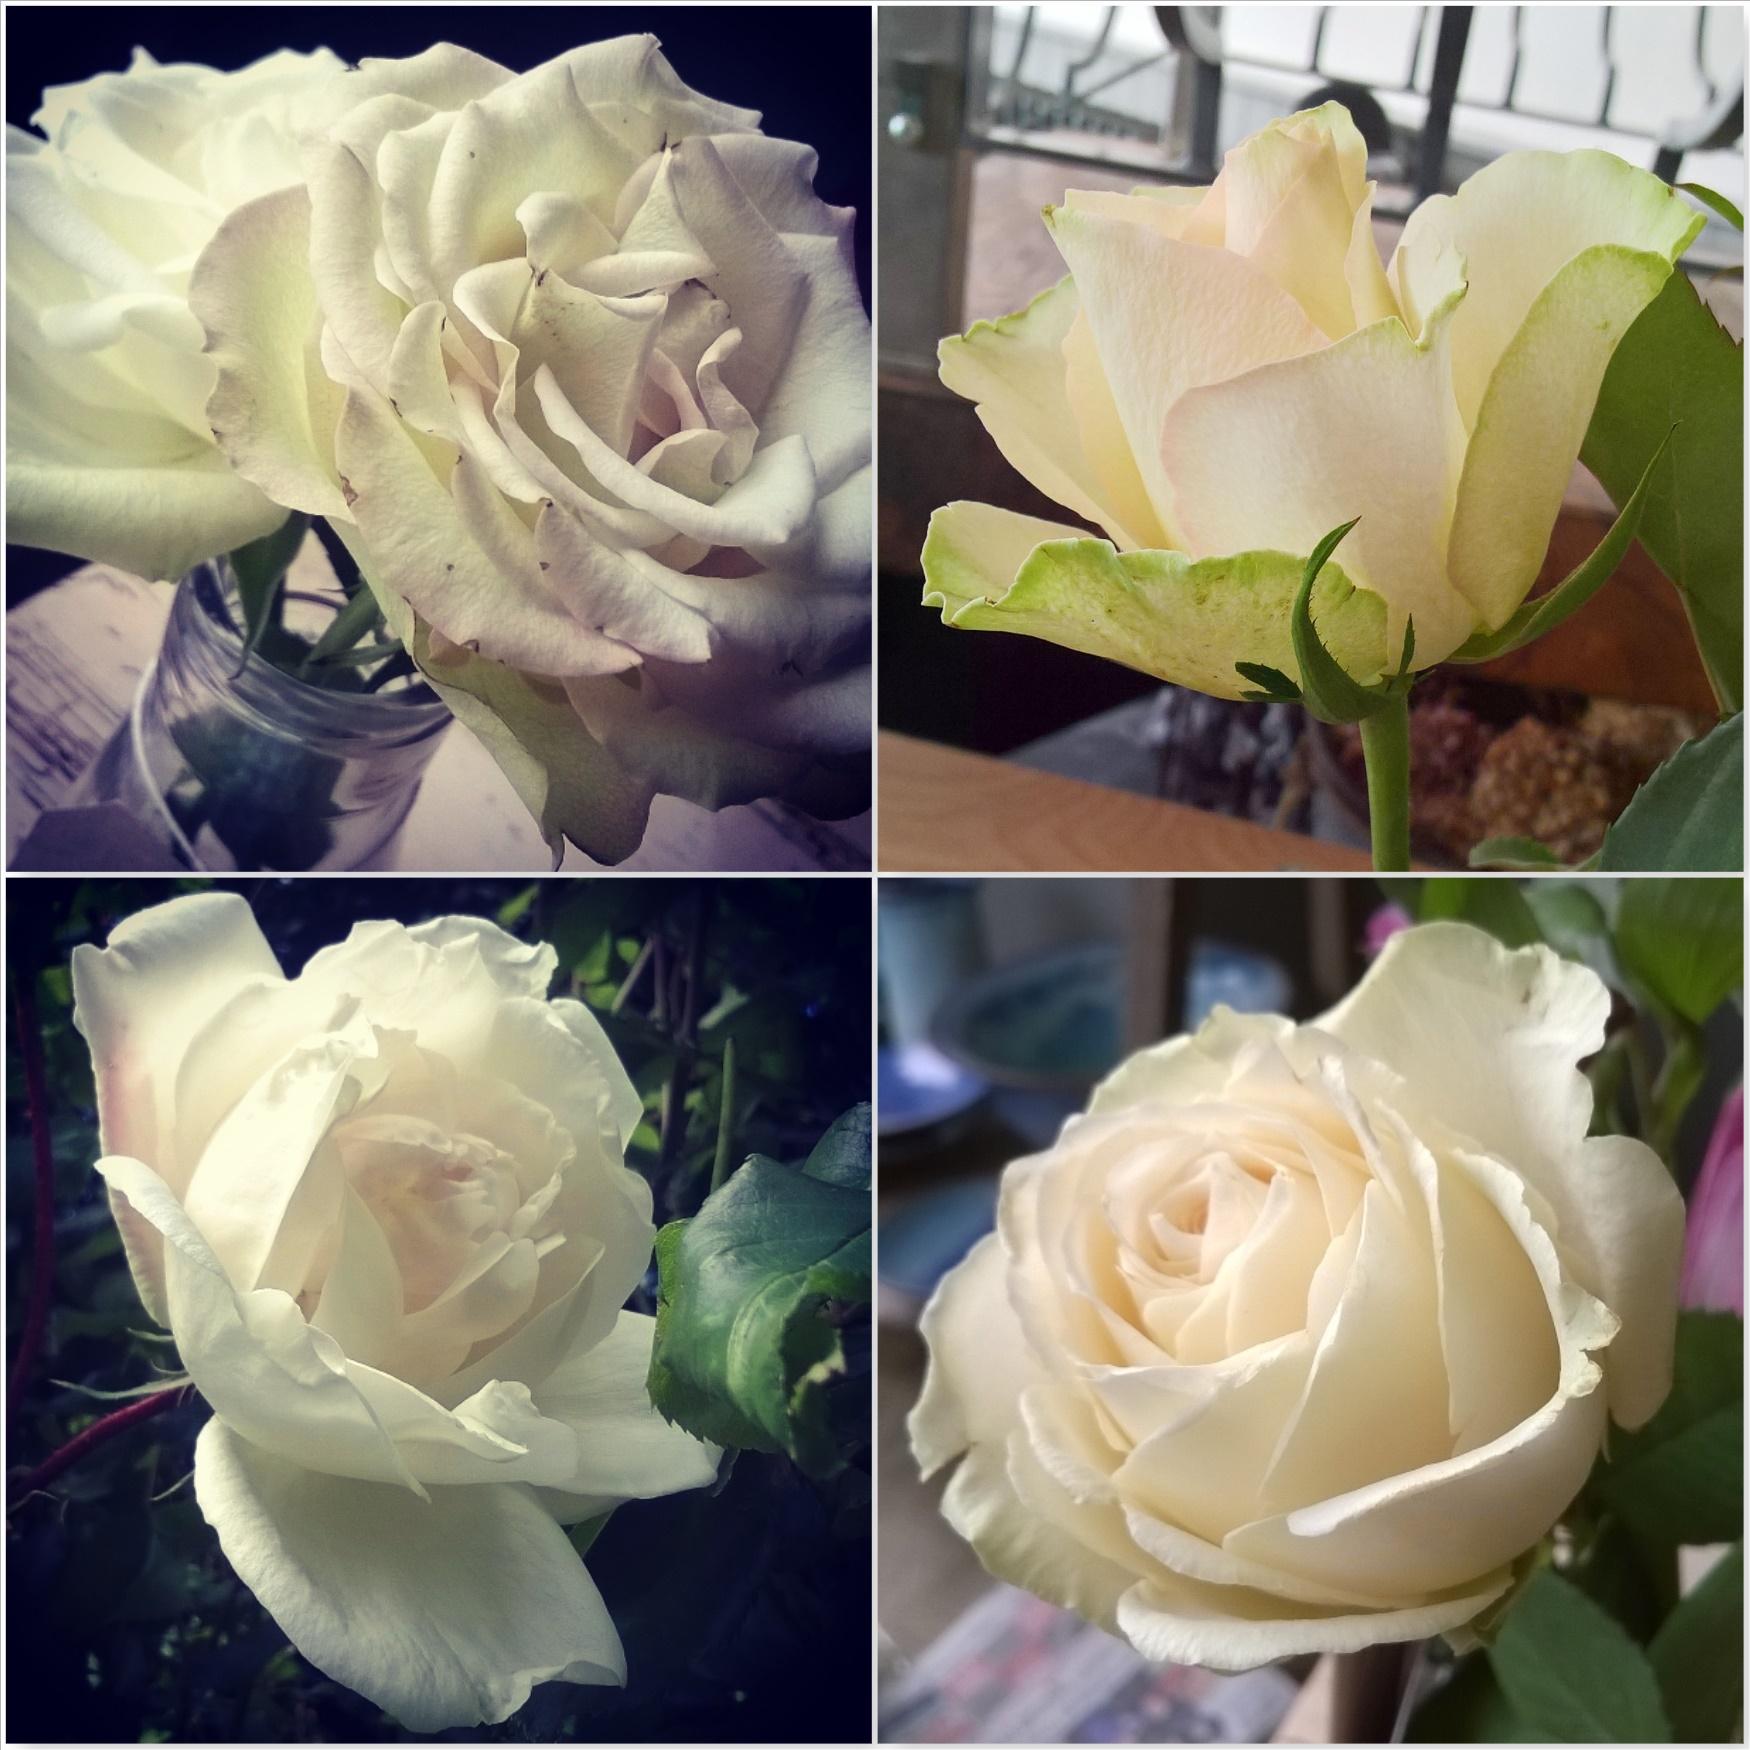 White-Roses-The-Last-Krystallos